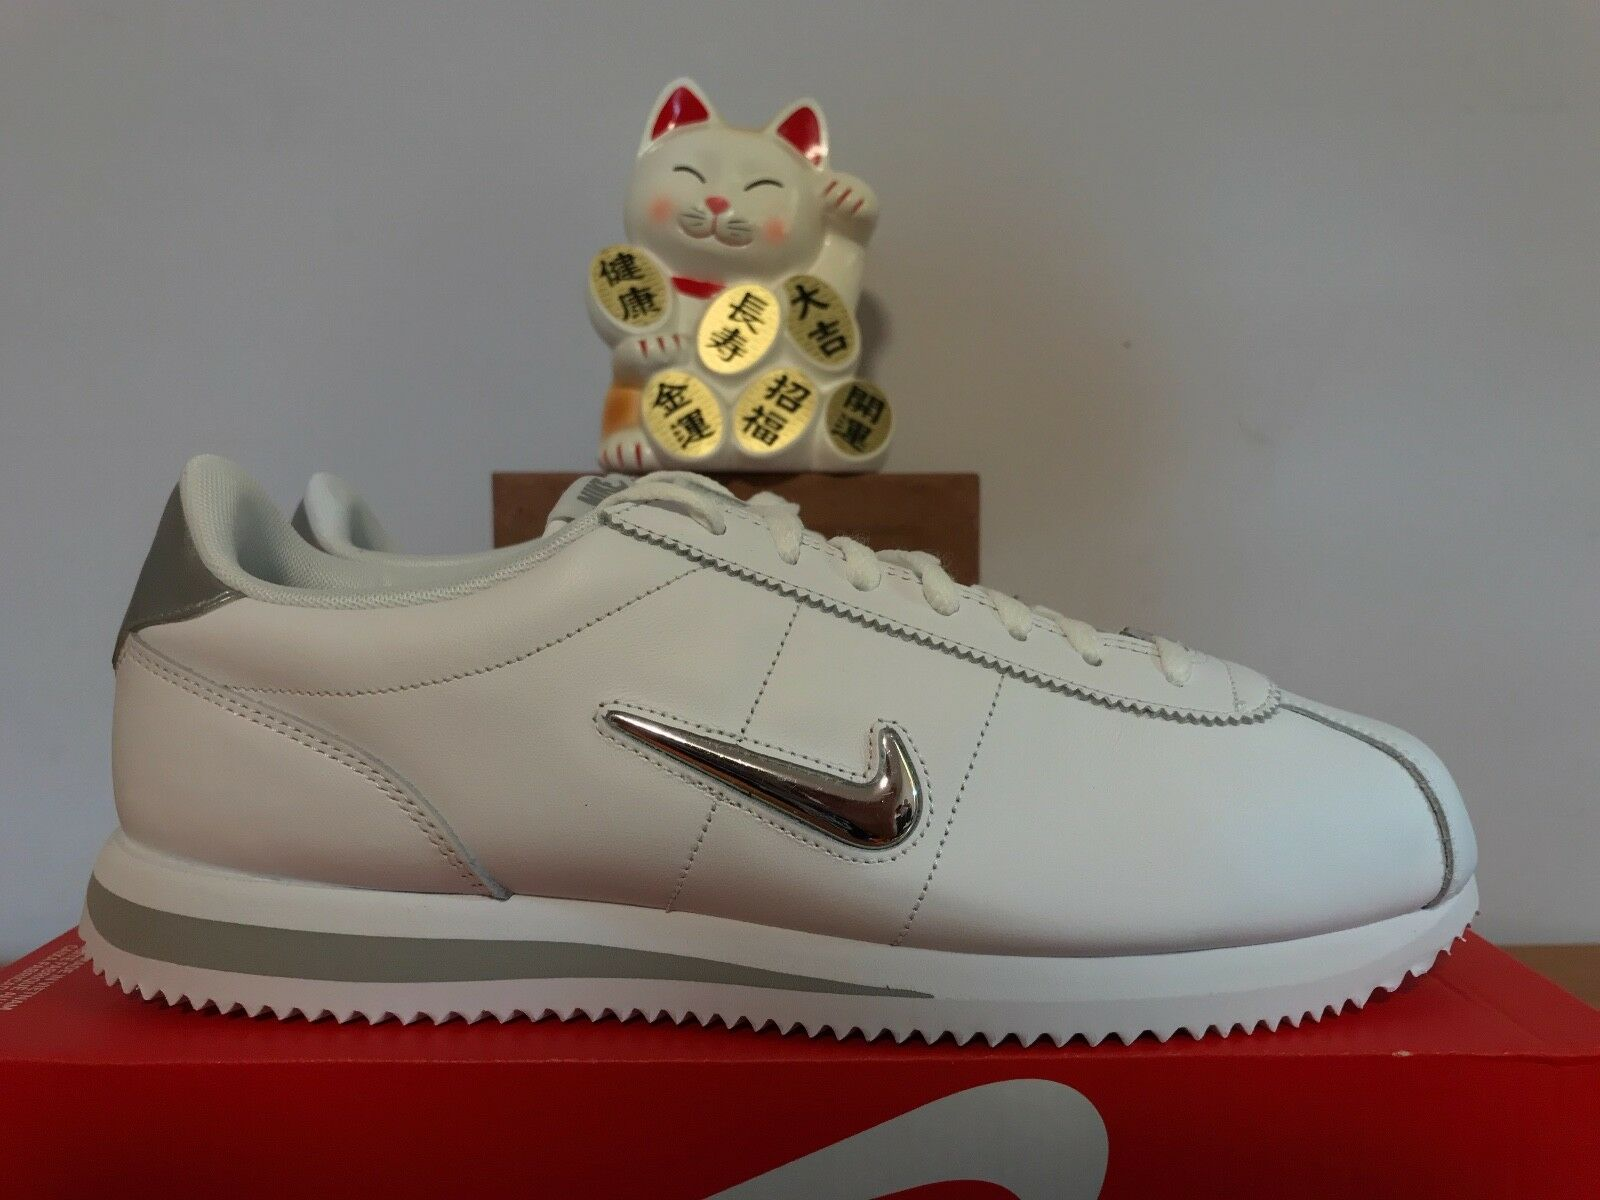 Nike Cortez Basic Jewel White Metallic Silver New 11.5 [833238-101]